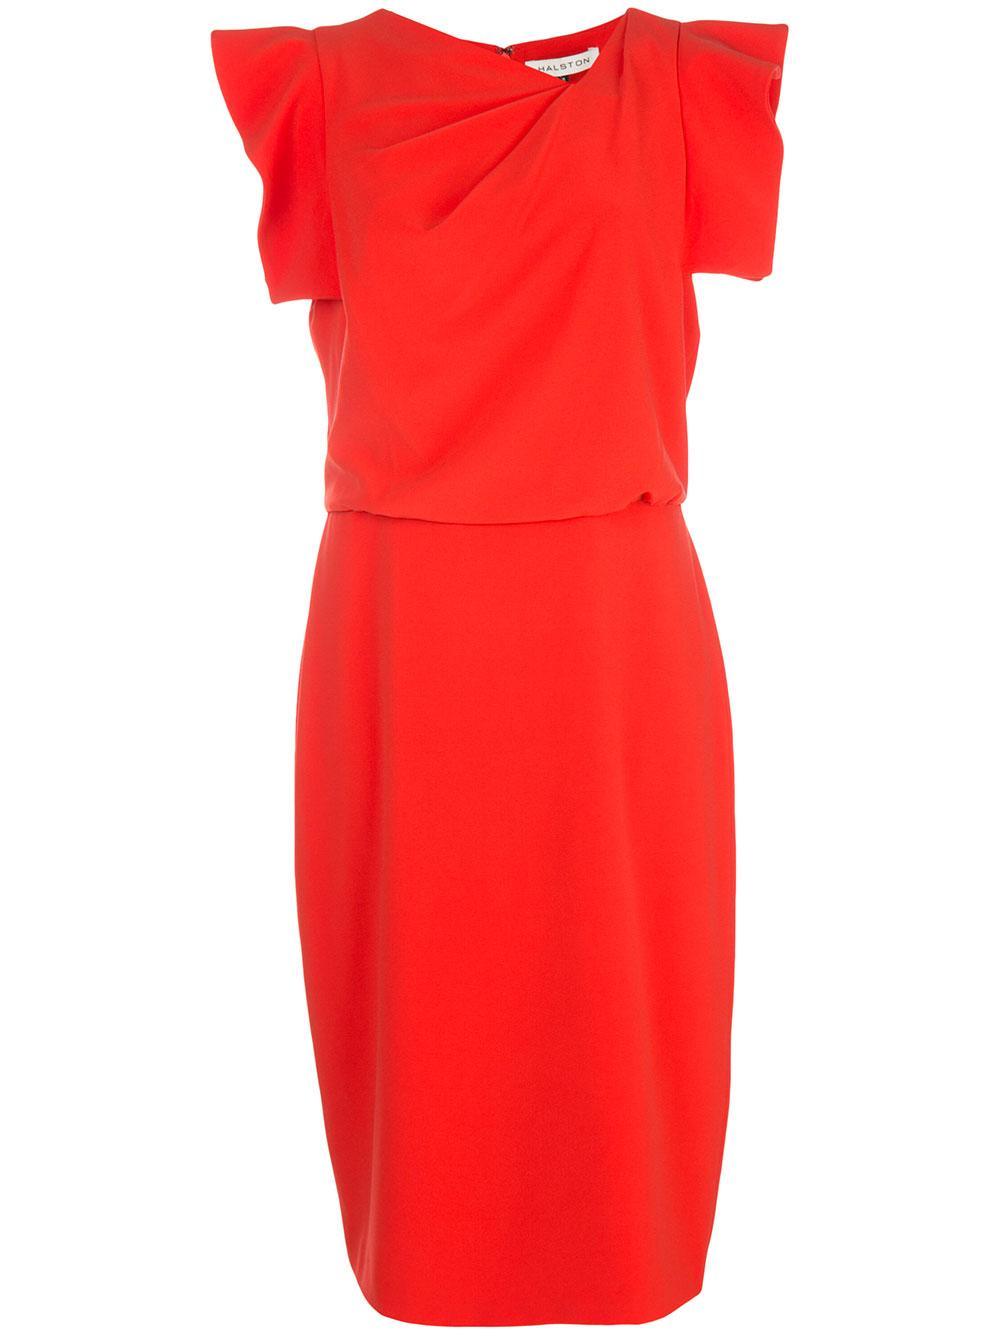 Asymmetric Neckline Ruffle Dress Item # 2011009